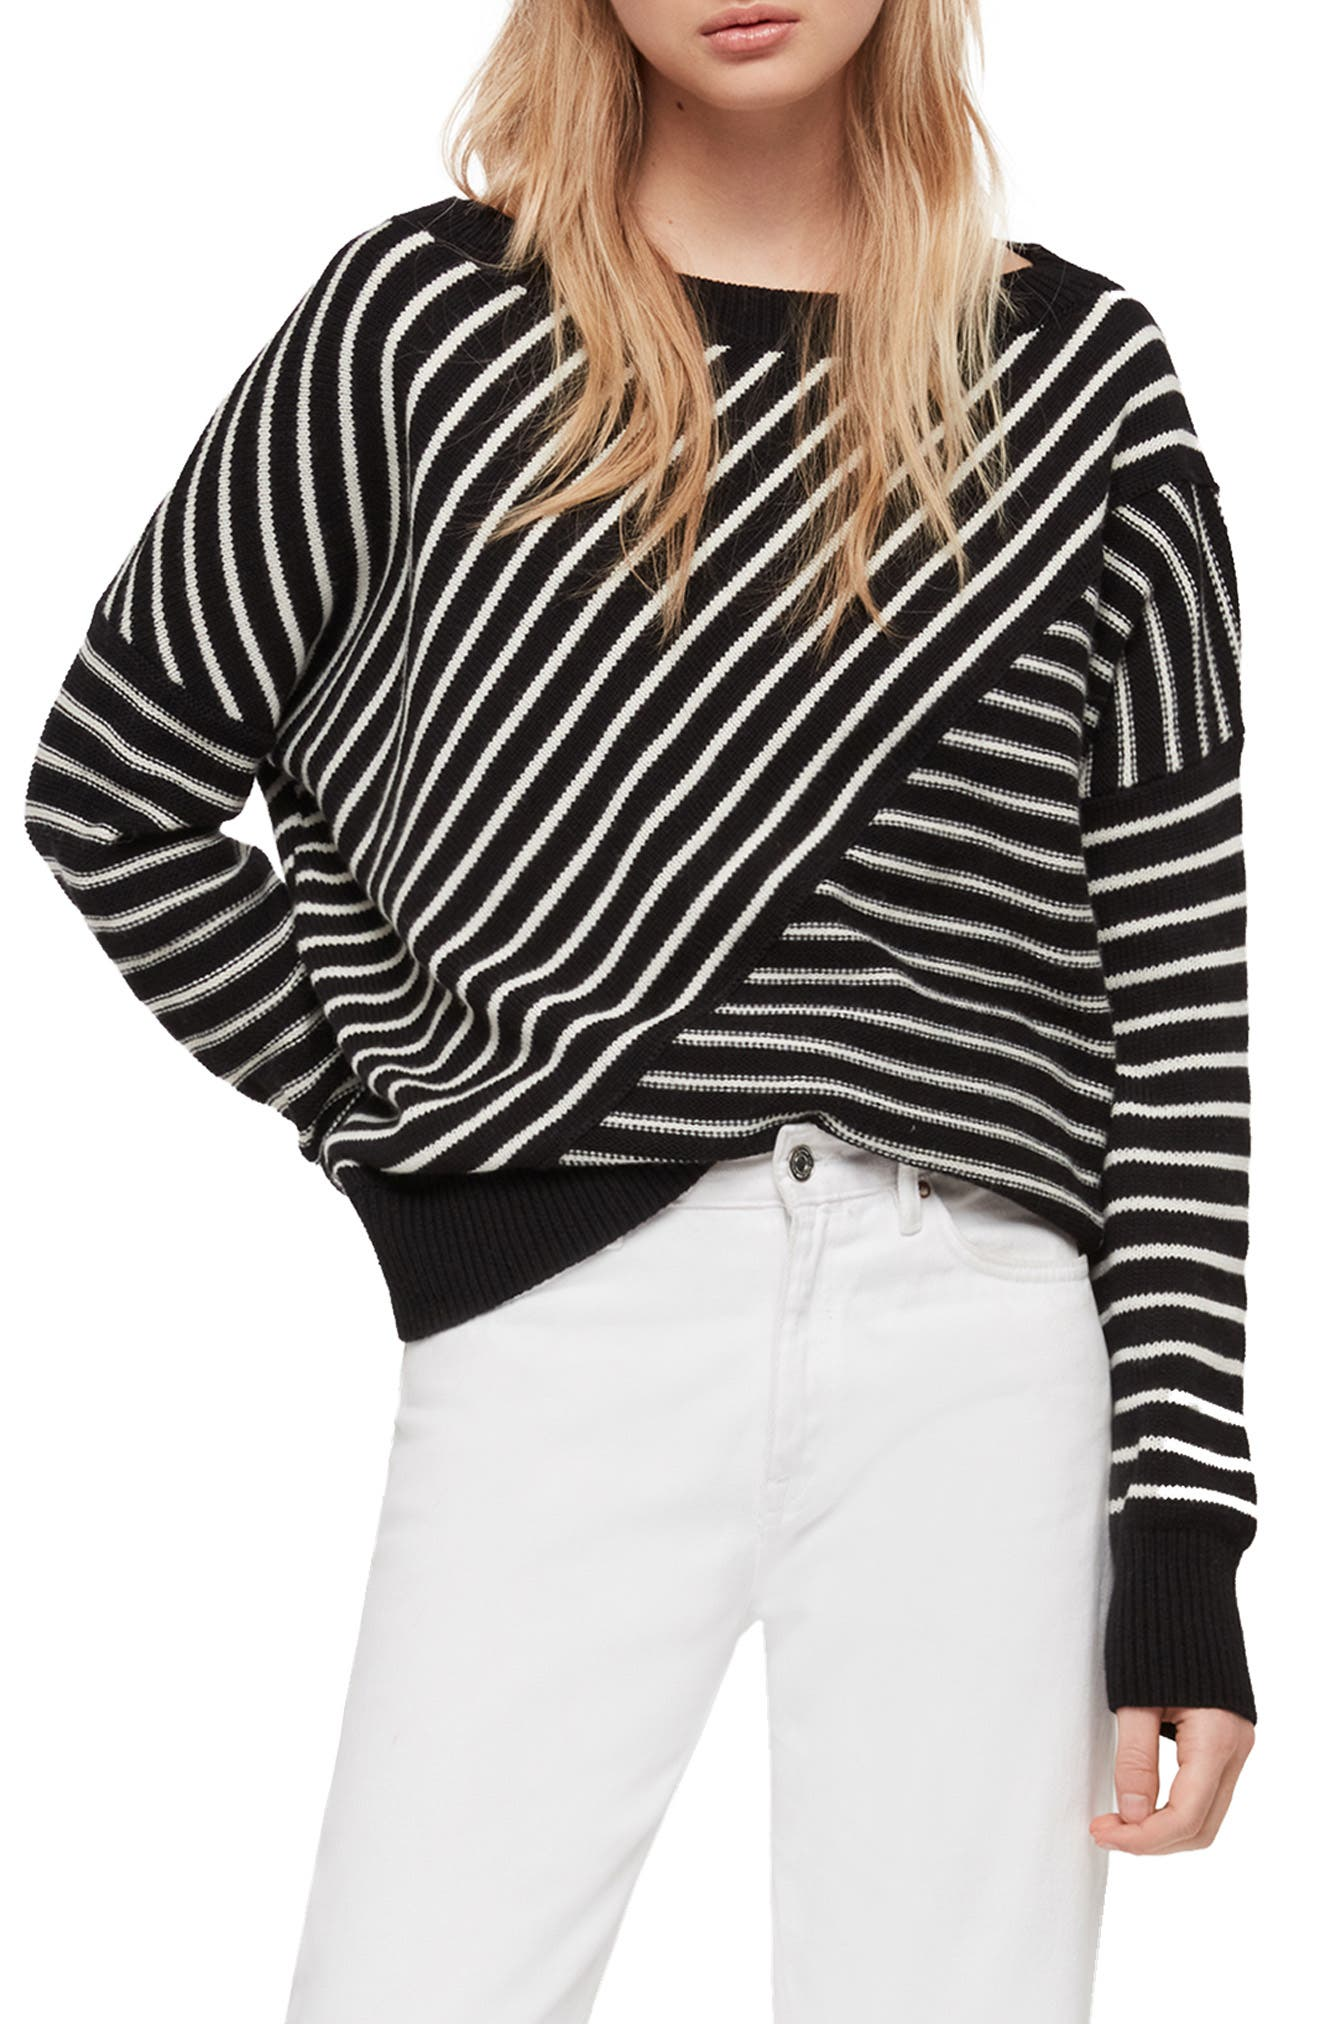 ALLSAINTS, Vani Sweater, Main thumbnail 1, color, BLACK/ CHALK WHITE